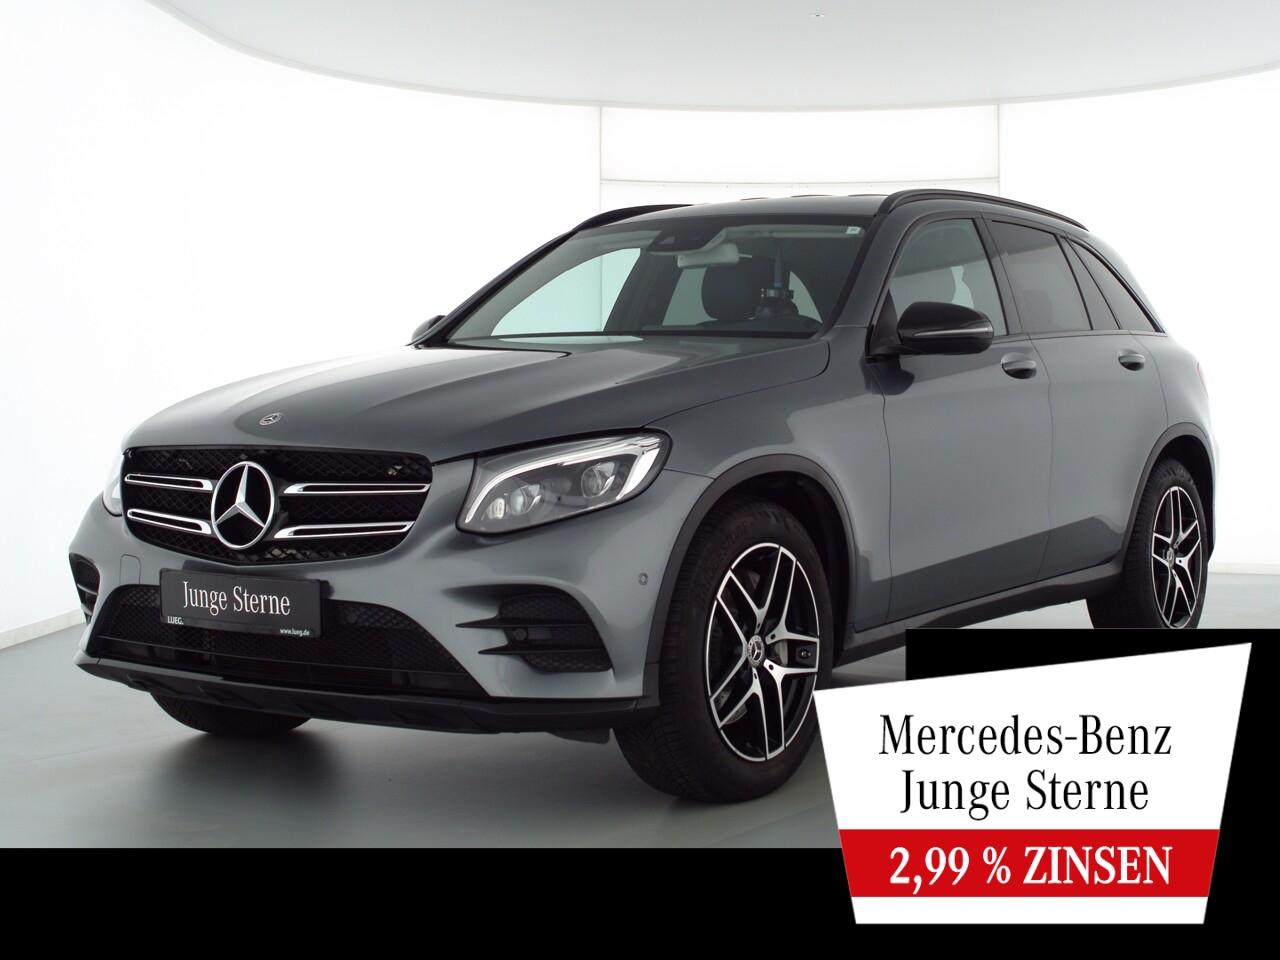 Mercedes-Benz GLC 300 4M AMG+Navi+LED+Sthzg+19''+Night+CarP+RF, Jahr 2018, Benzin